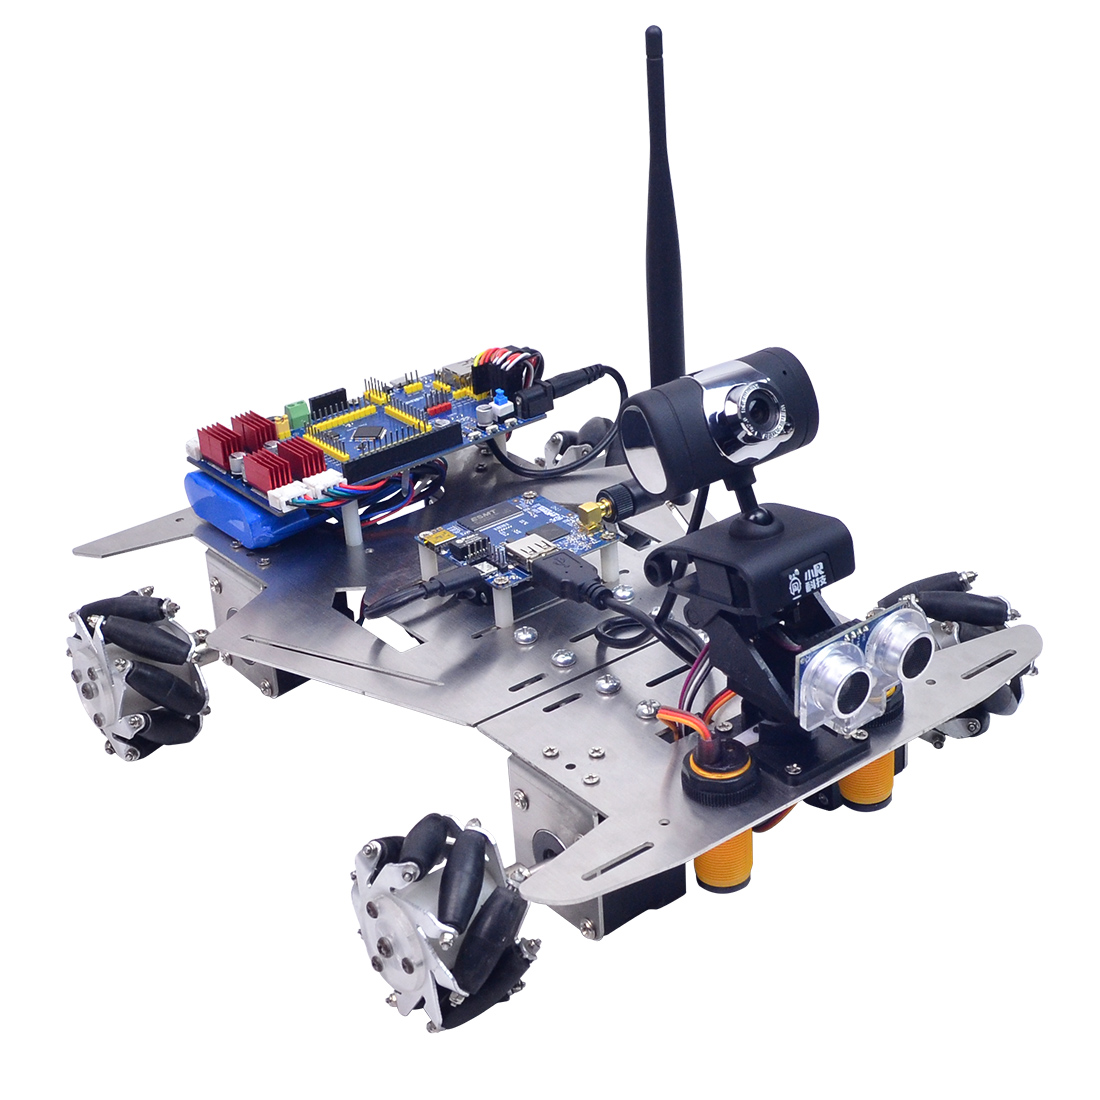 XR Master Omni-Directional Mecanum Wheel Robot Programmable Toys For Kids - WIFI Version / WIFI + Bluetooth Version